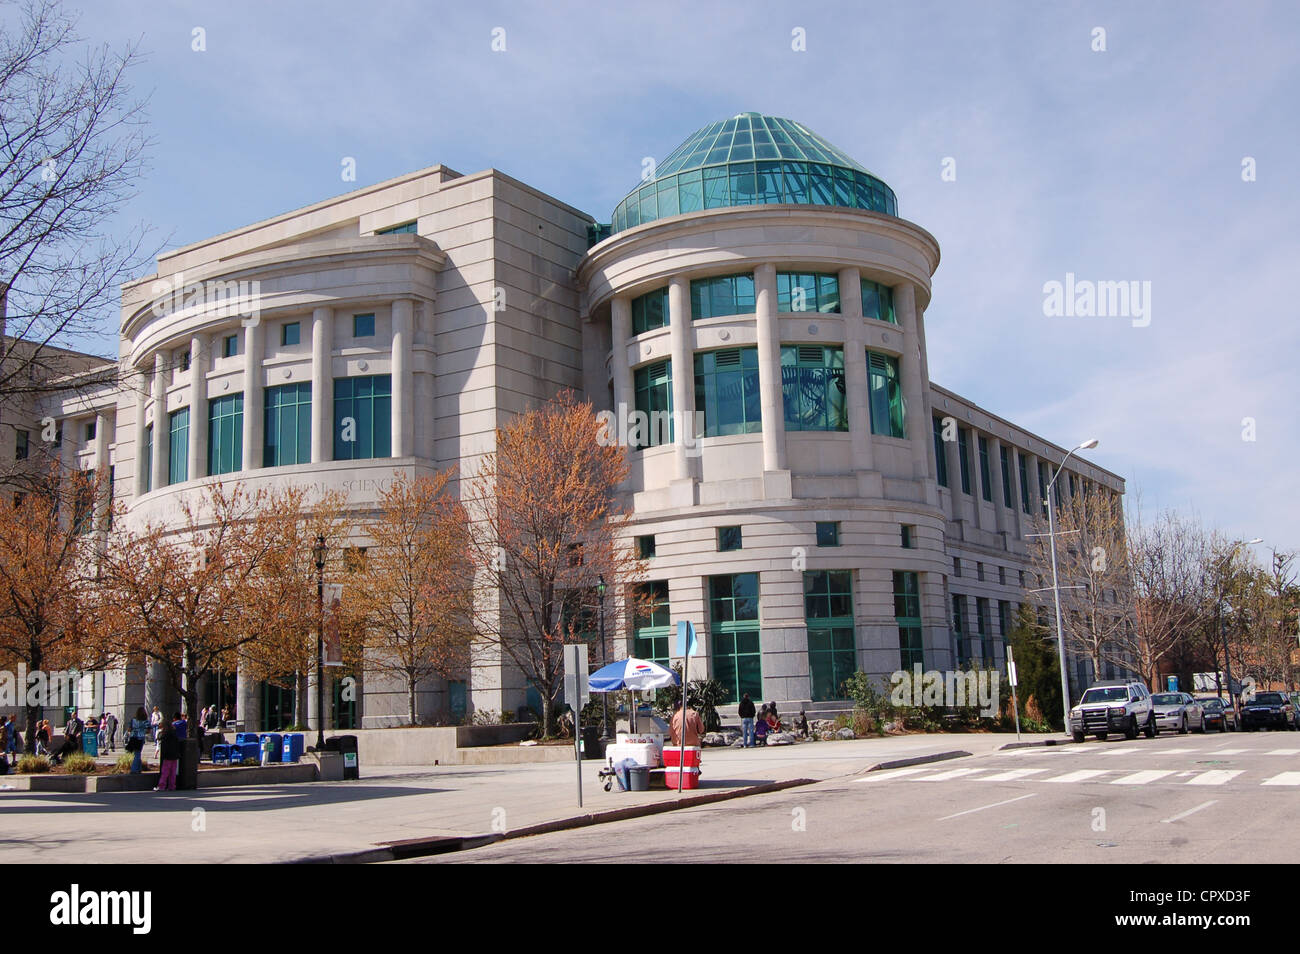 North Carolina Museum of Natural Sciences, Raleigh, North Carolina - Stock Image